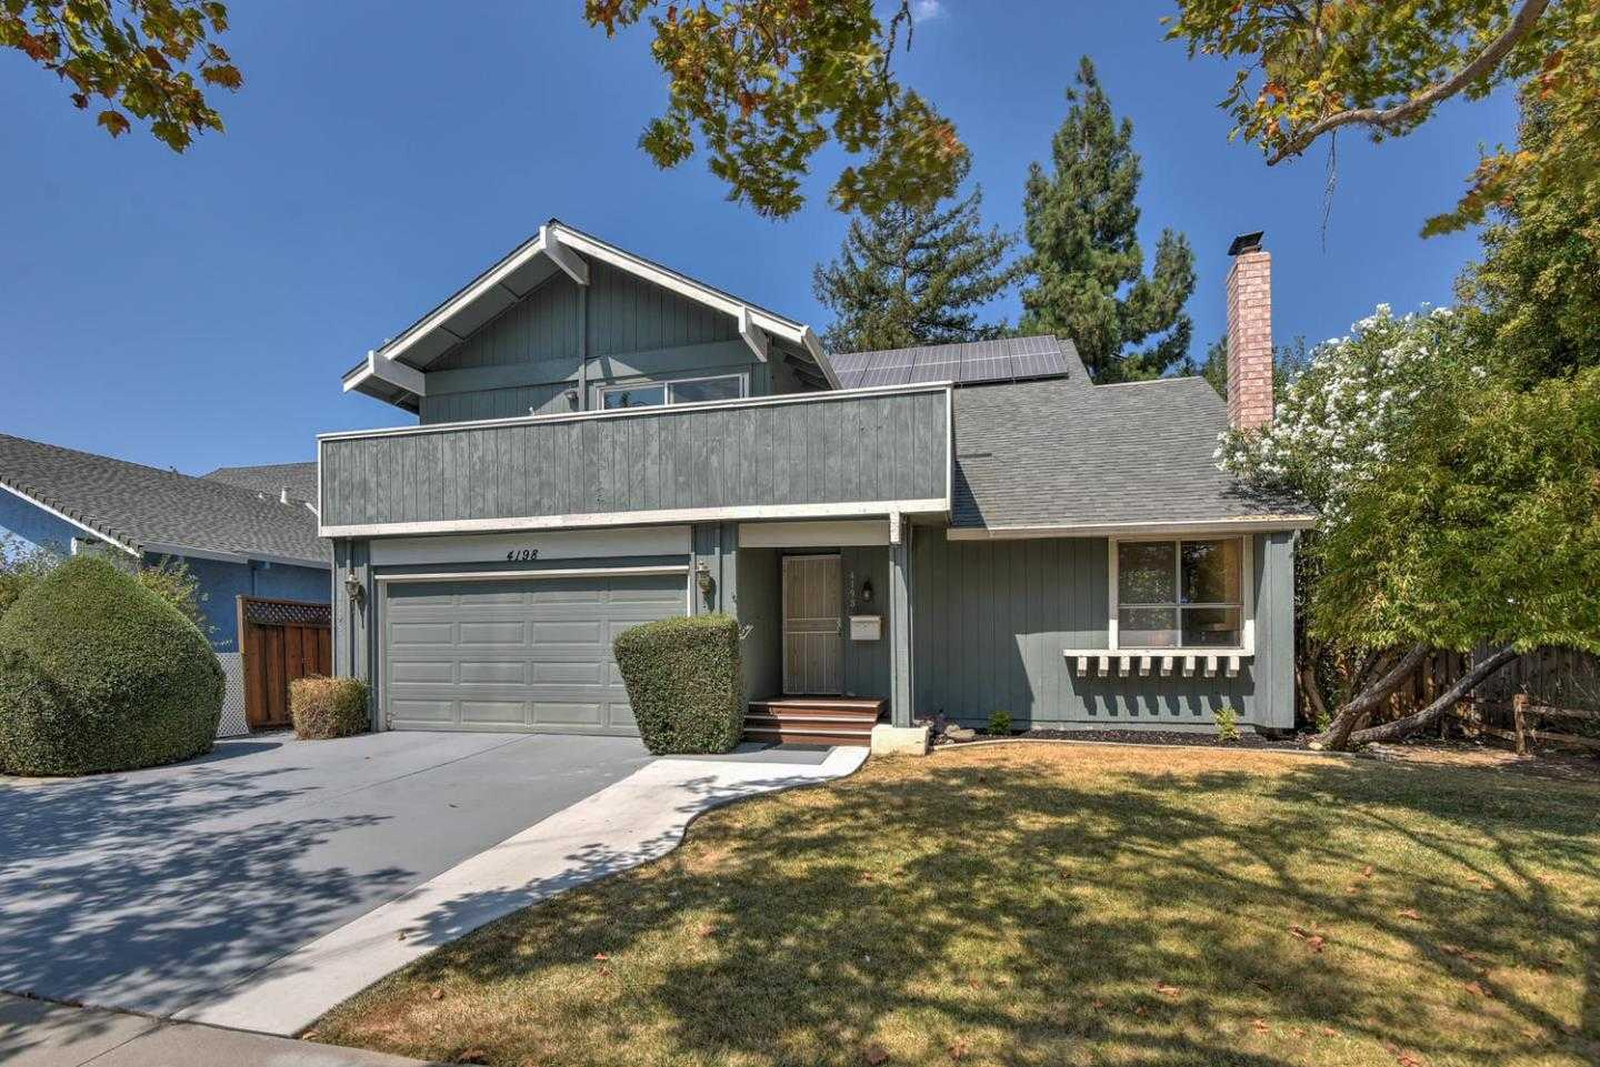 4198 Rosenbaum Ave San Jose, CA 95136